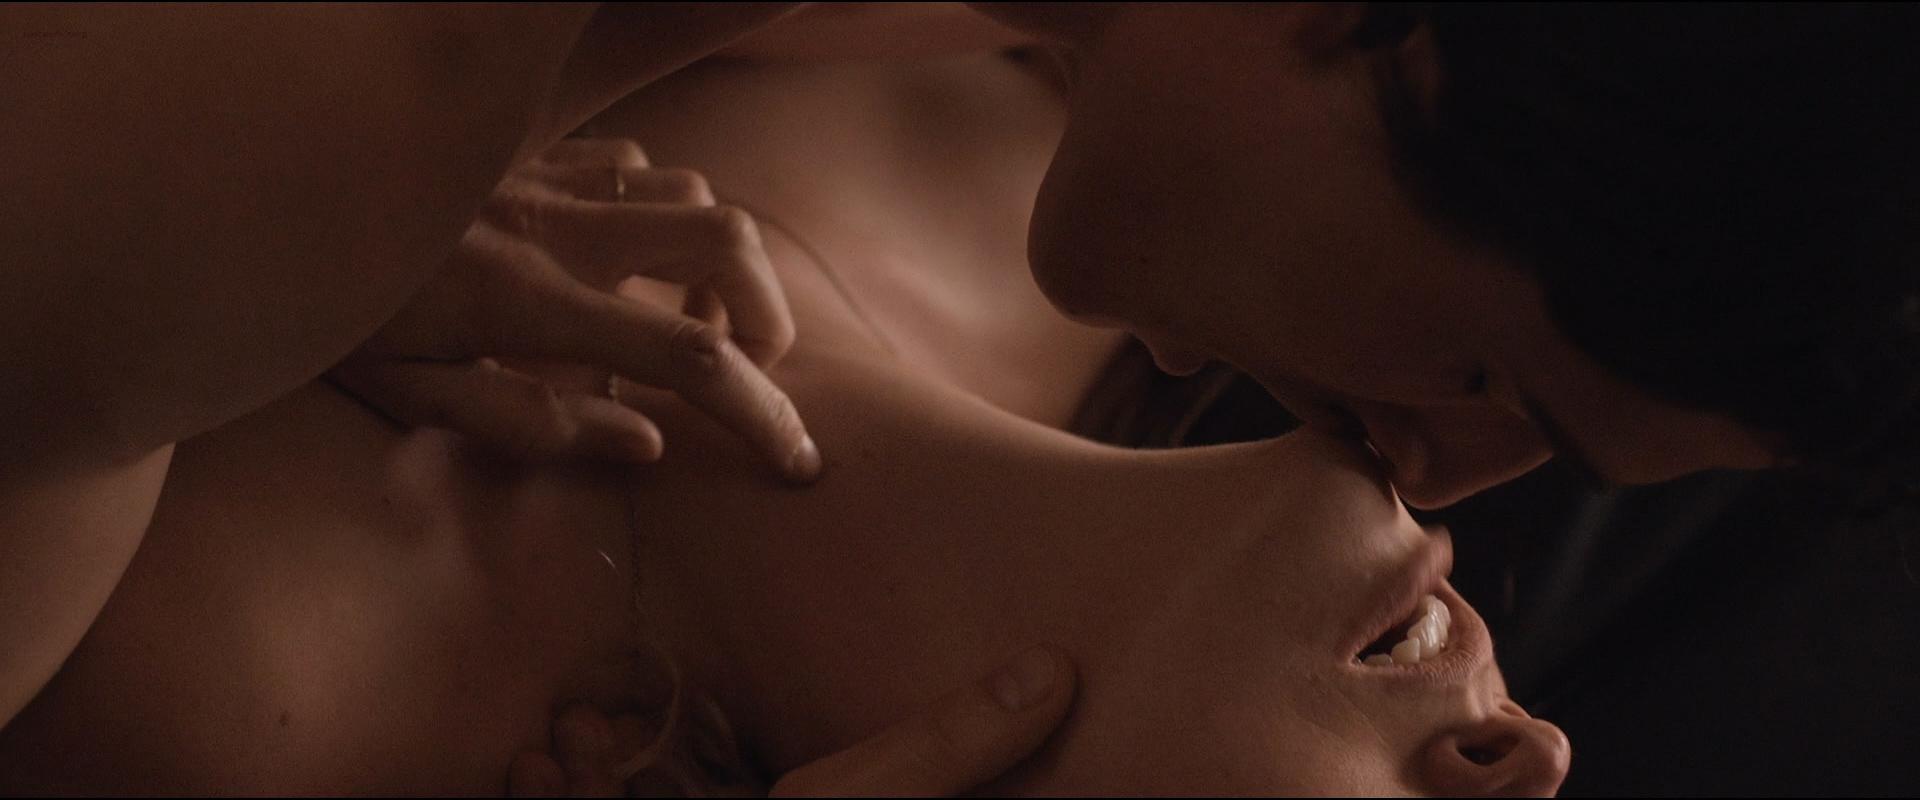 Loes Haverkort nude hot sex - Rendez-Vous (NL-2015) HD 1080p BluRay (7)